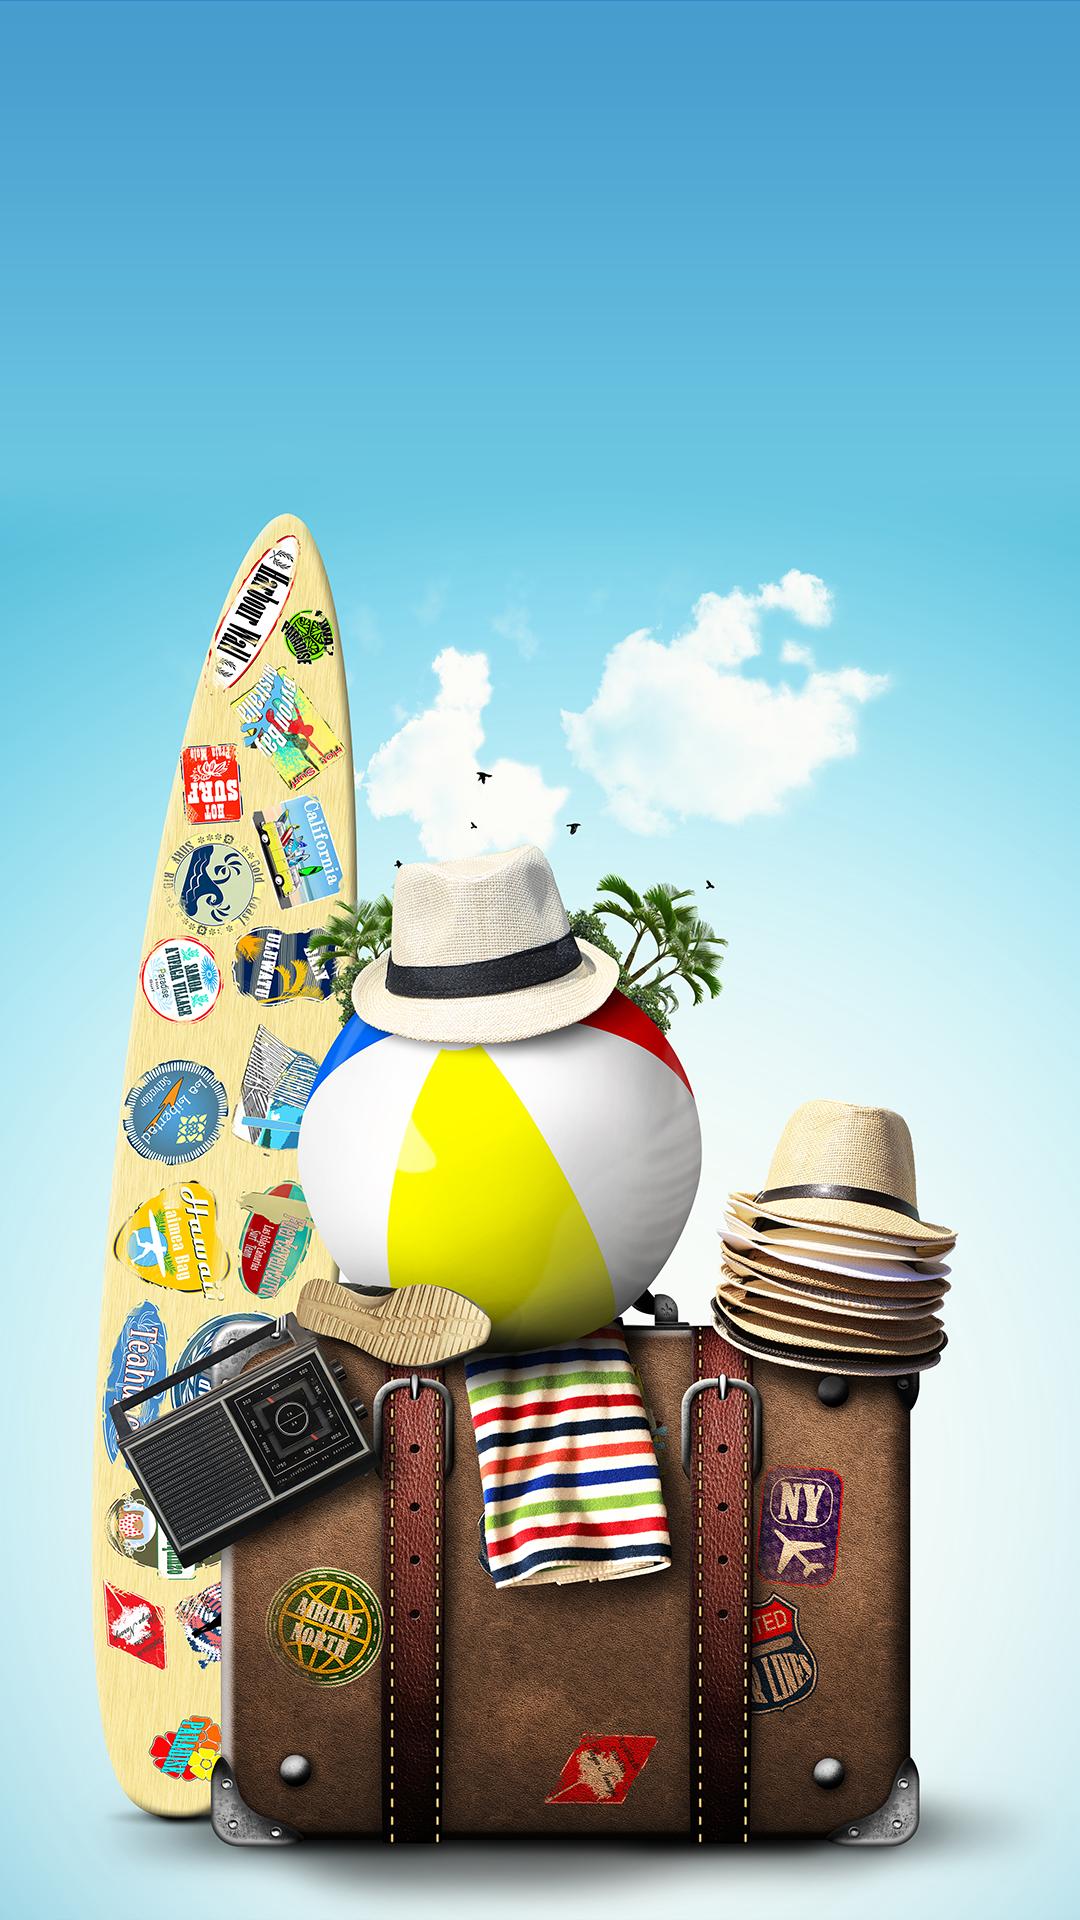 TAP AND GET THE FREE APP! Art Creative Sky Bag Beach